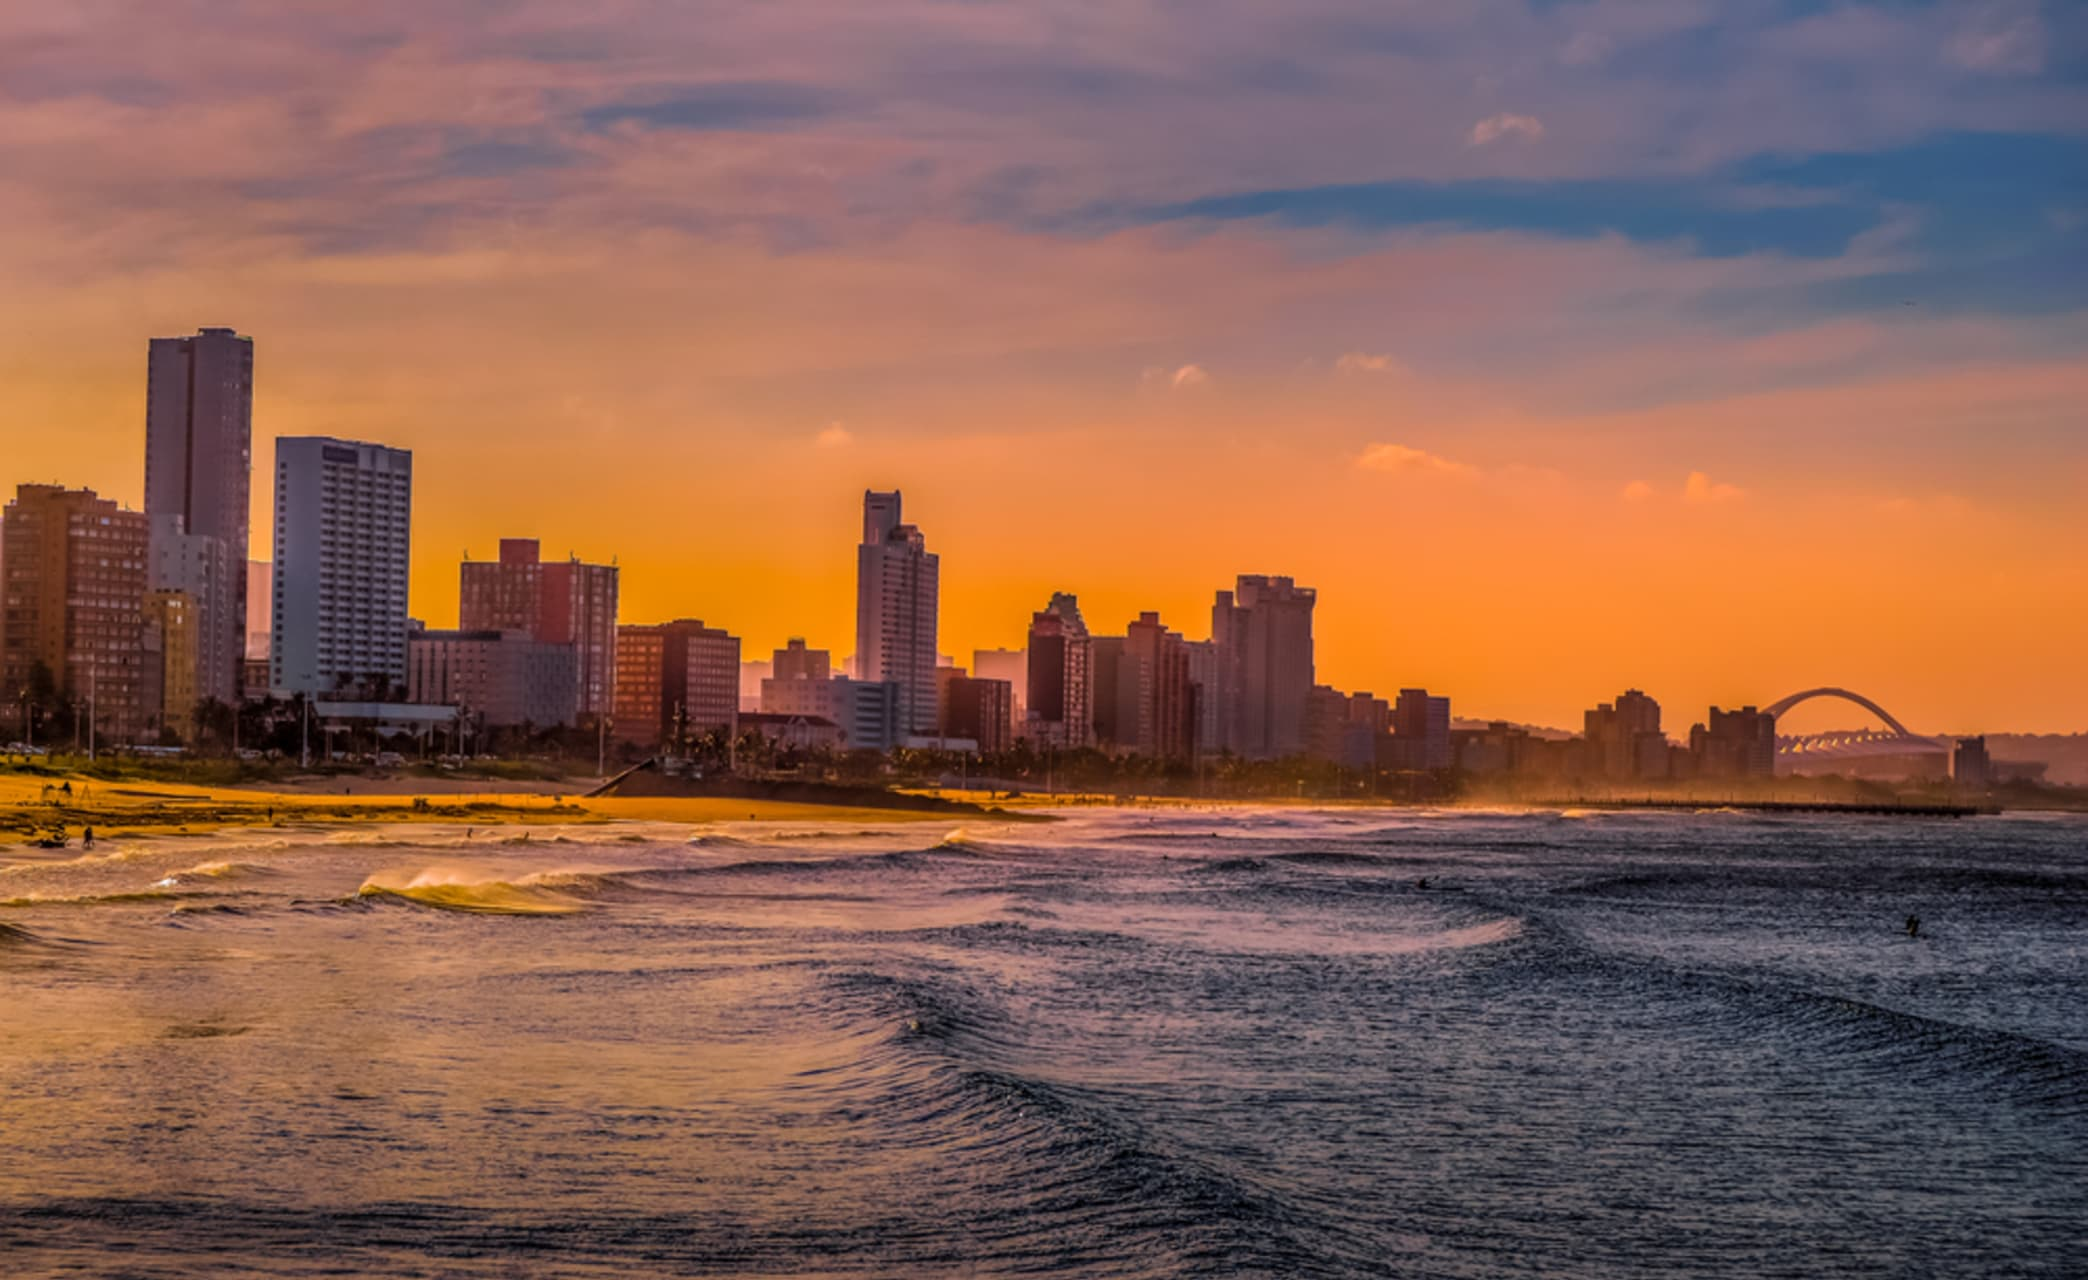 Saint Lucia - Showcasing Durban's vibrant beachfront